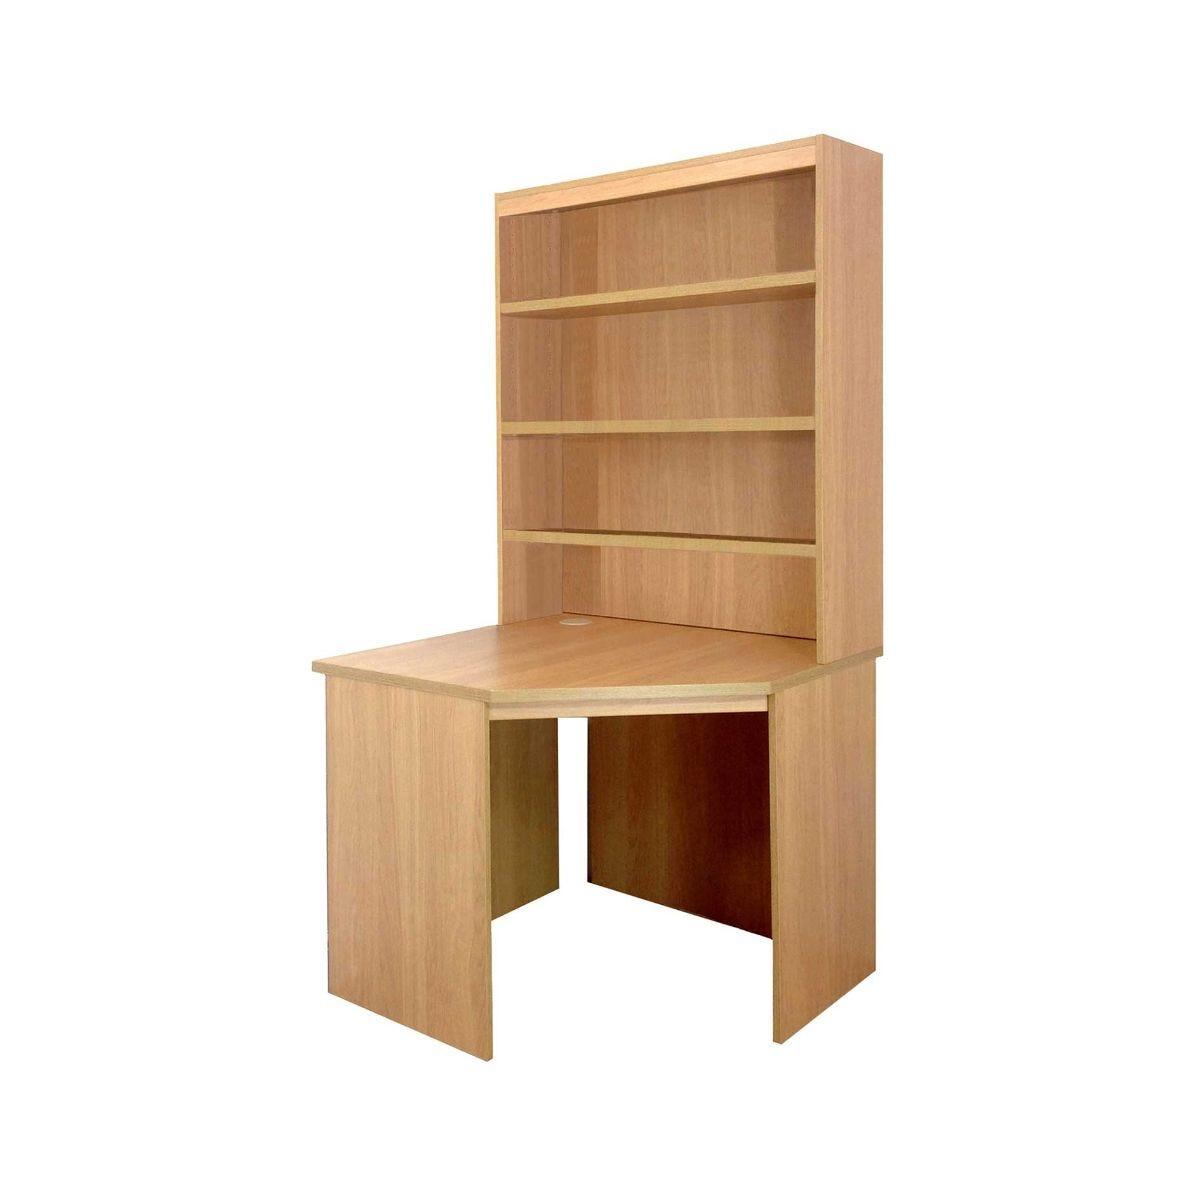 Super Desks Large Small Office Desks Home Desks Ryman Uk Download Free Architecture Designs Scobabritishbridgeorg